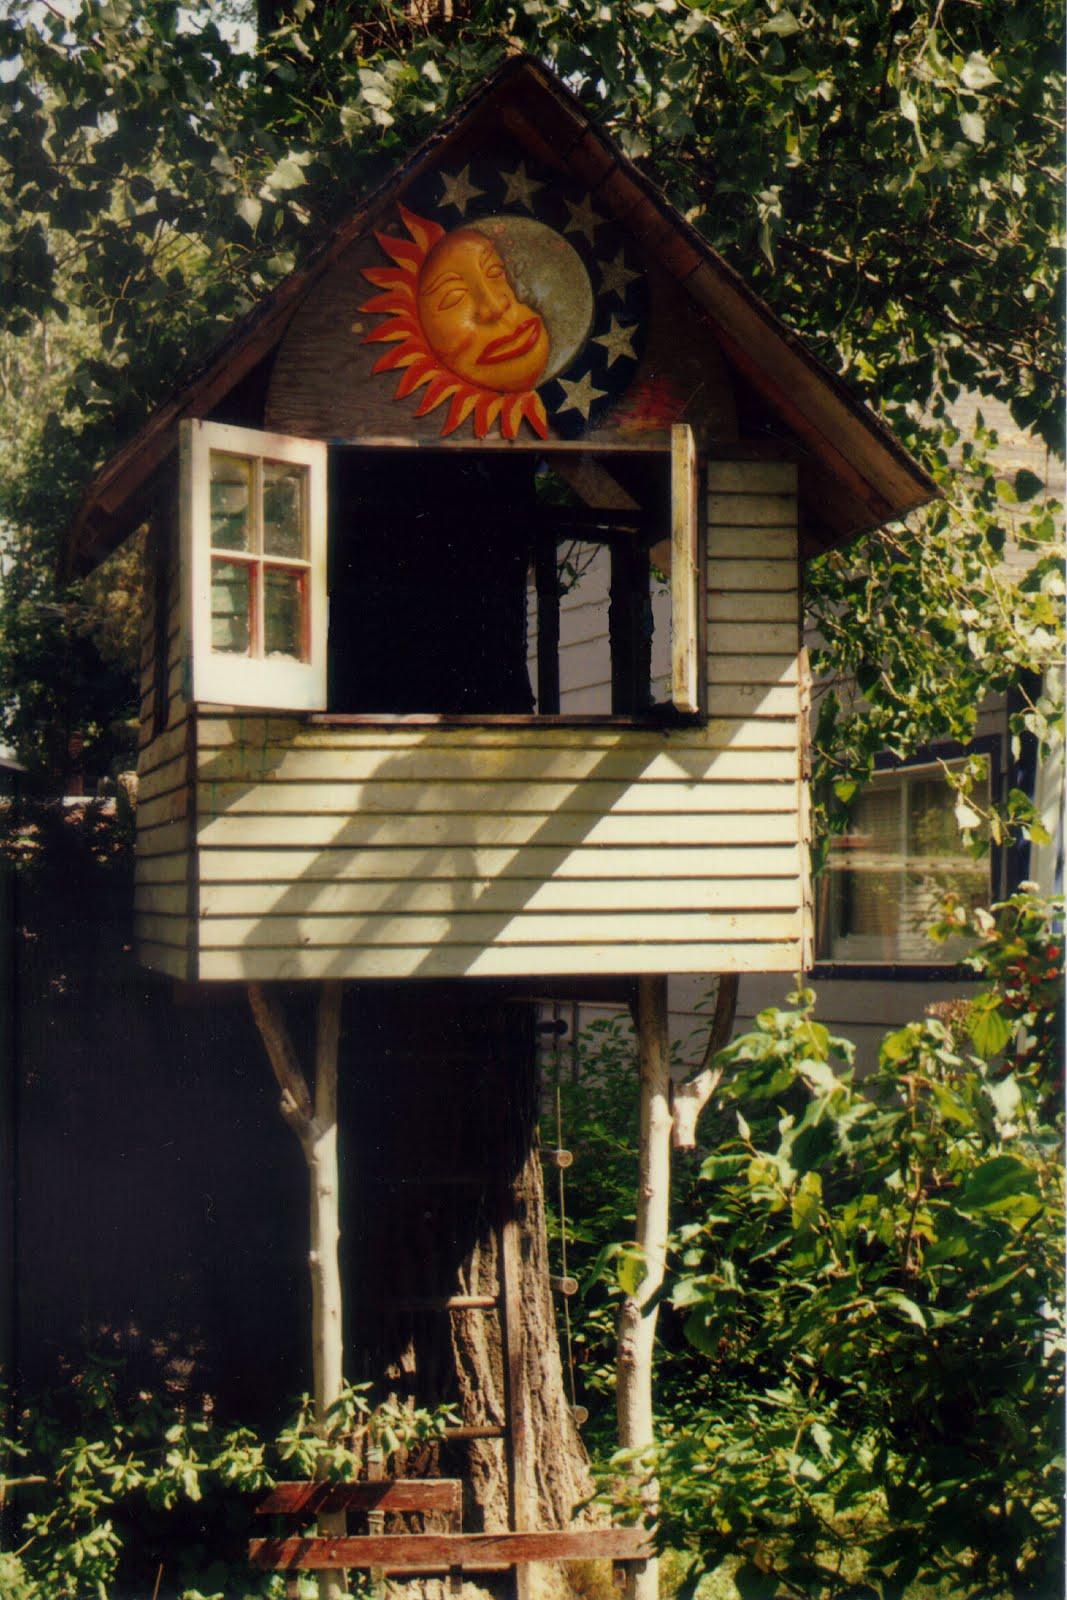 La casa del rbol interior for Arbol interior